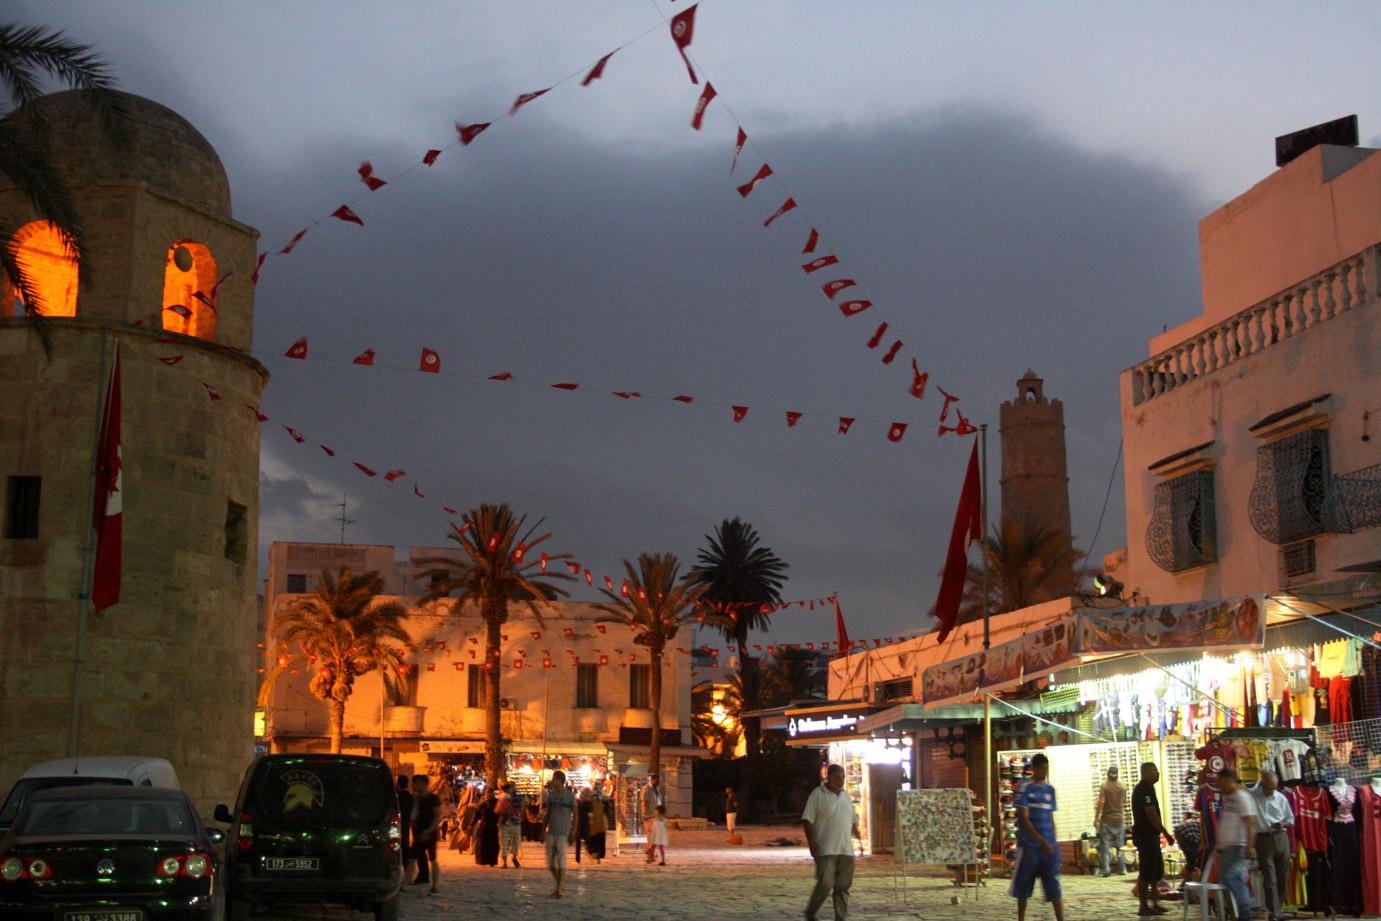 TUNISIA: PHOTO DIARY II. 19